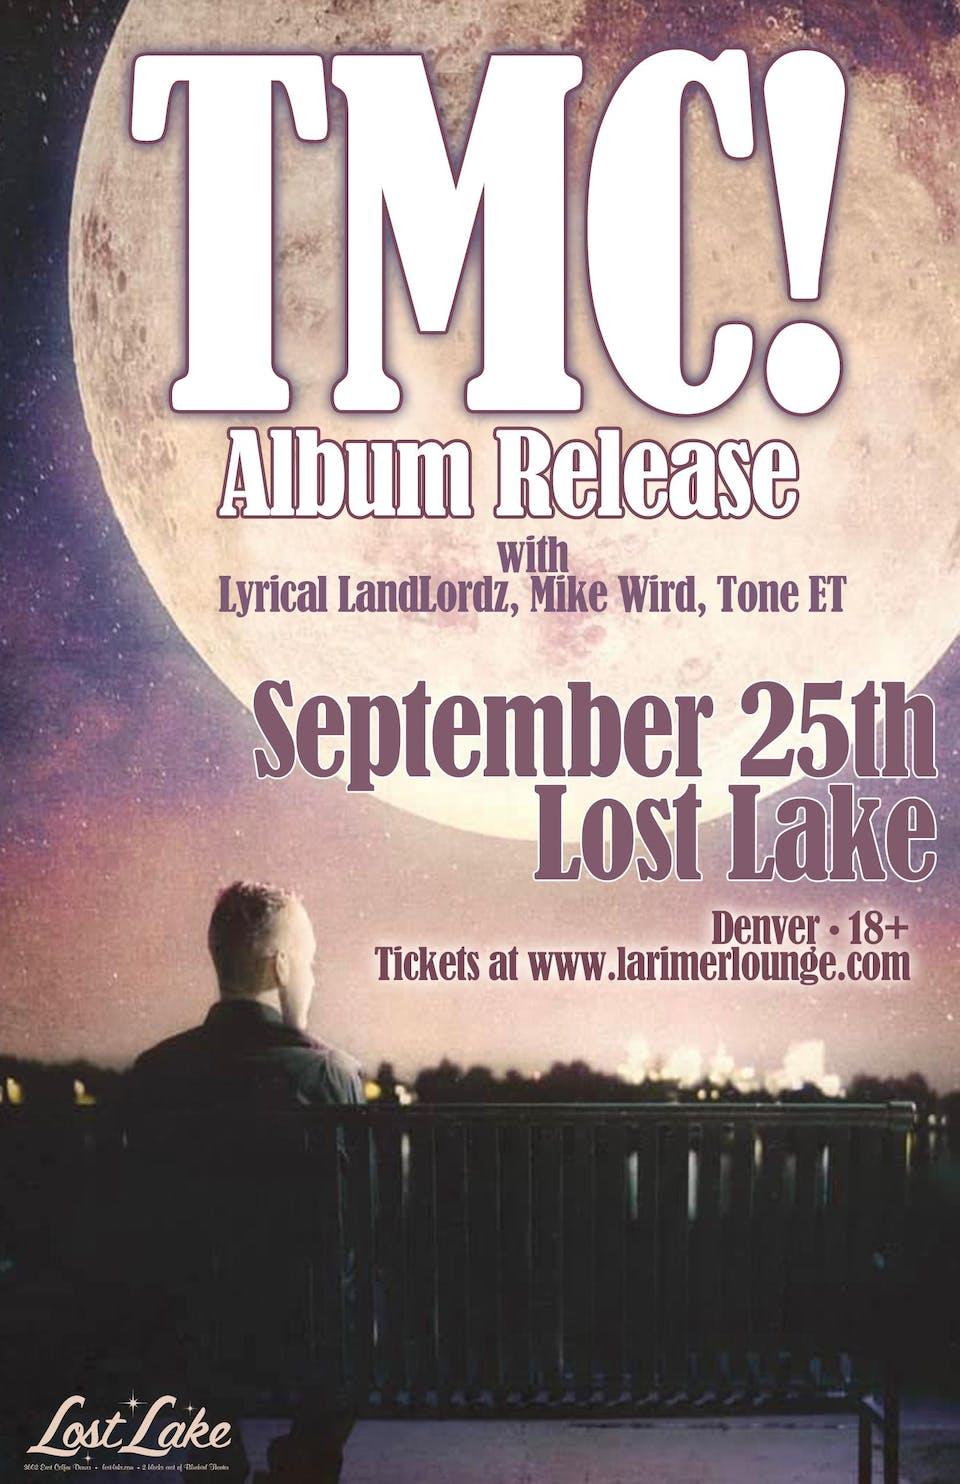 TMC! (Album Release) / Lyrical LandLordz  / Mike Wird / Tone ET